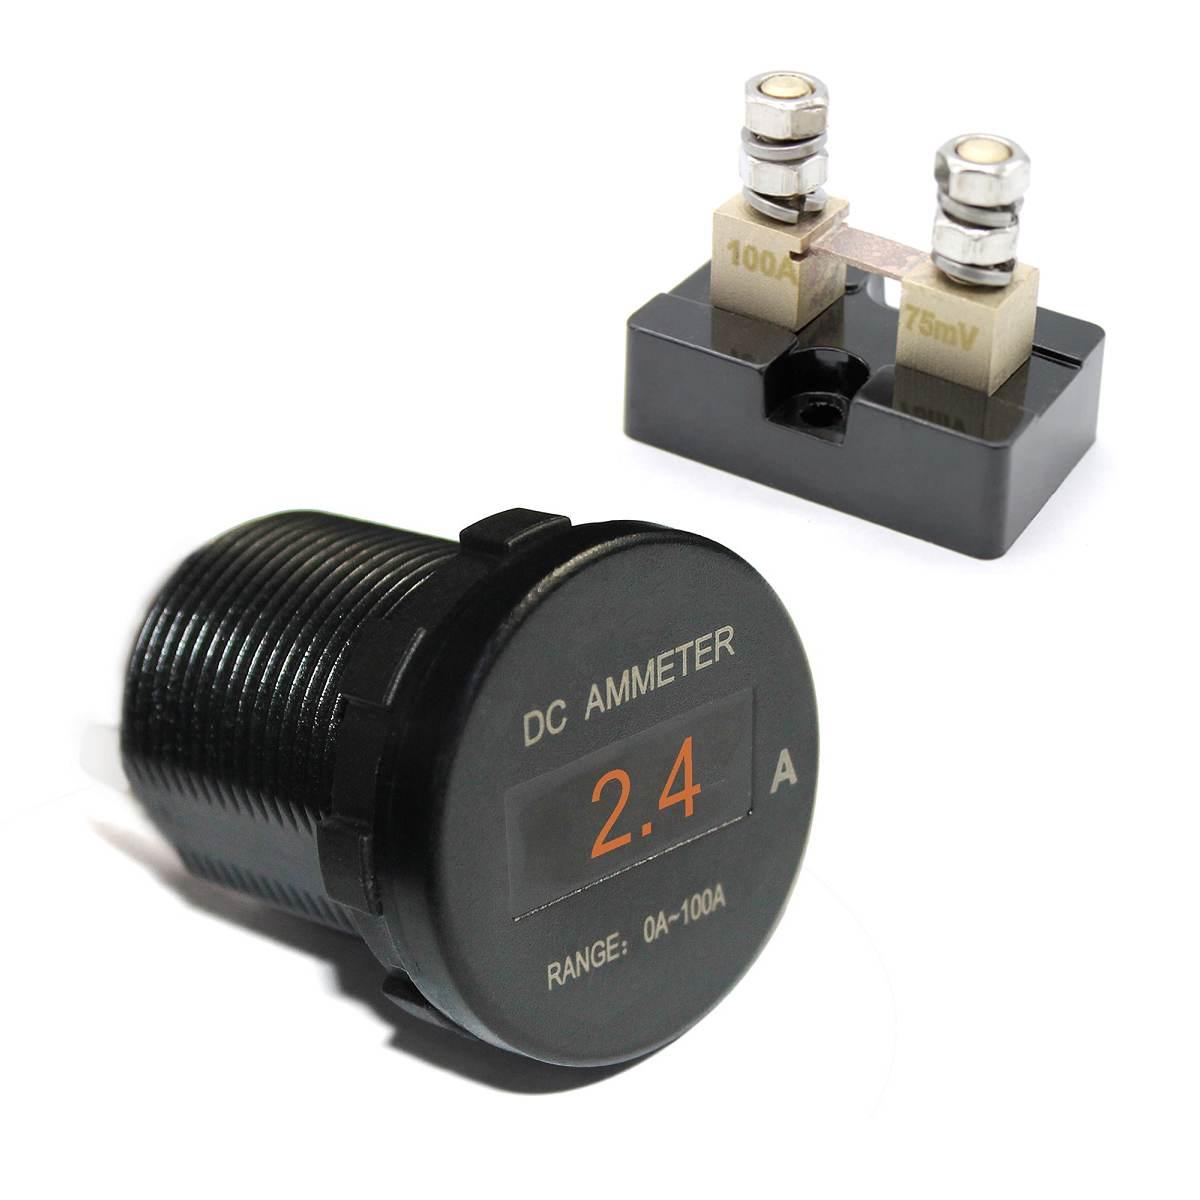 Universal Auto Boot Marine Mini Digital Oled Dc Amperemeter Monitor Strom Amp Meter 12 V/24 V 5 Farbe Bildschirm Wasserdicht Ip66